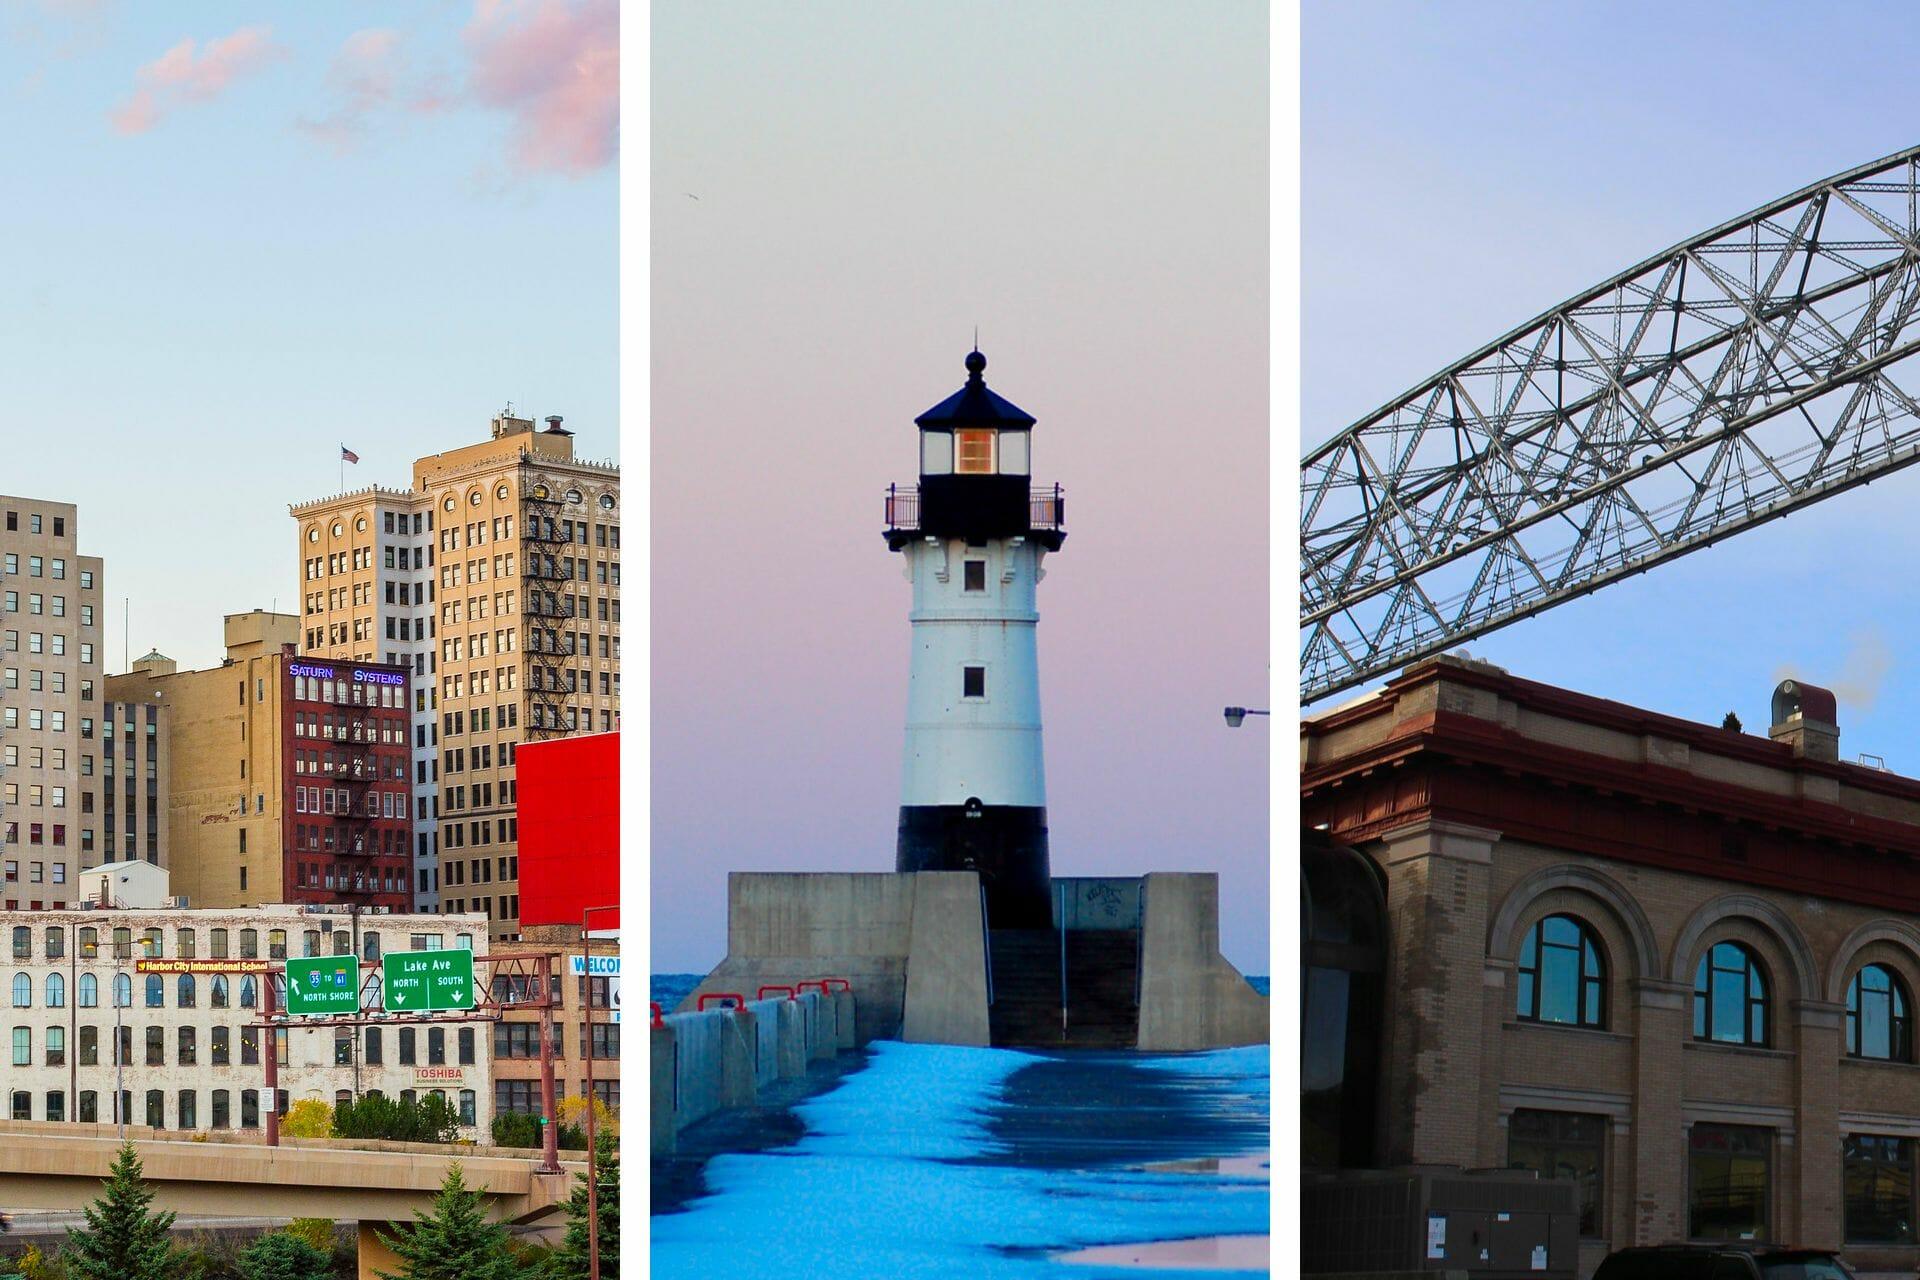 21+ Fabulous Things to Do in Duluth, Minnesota via @allamericanatlas